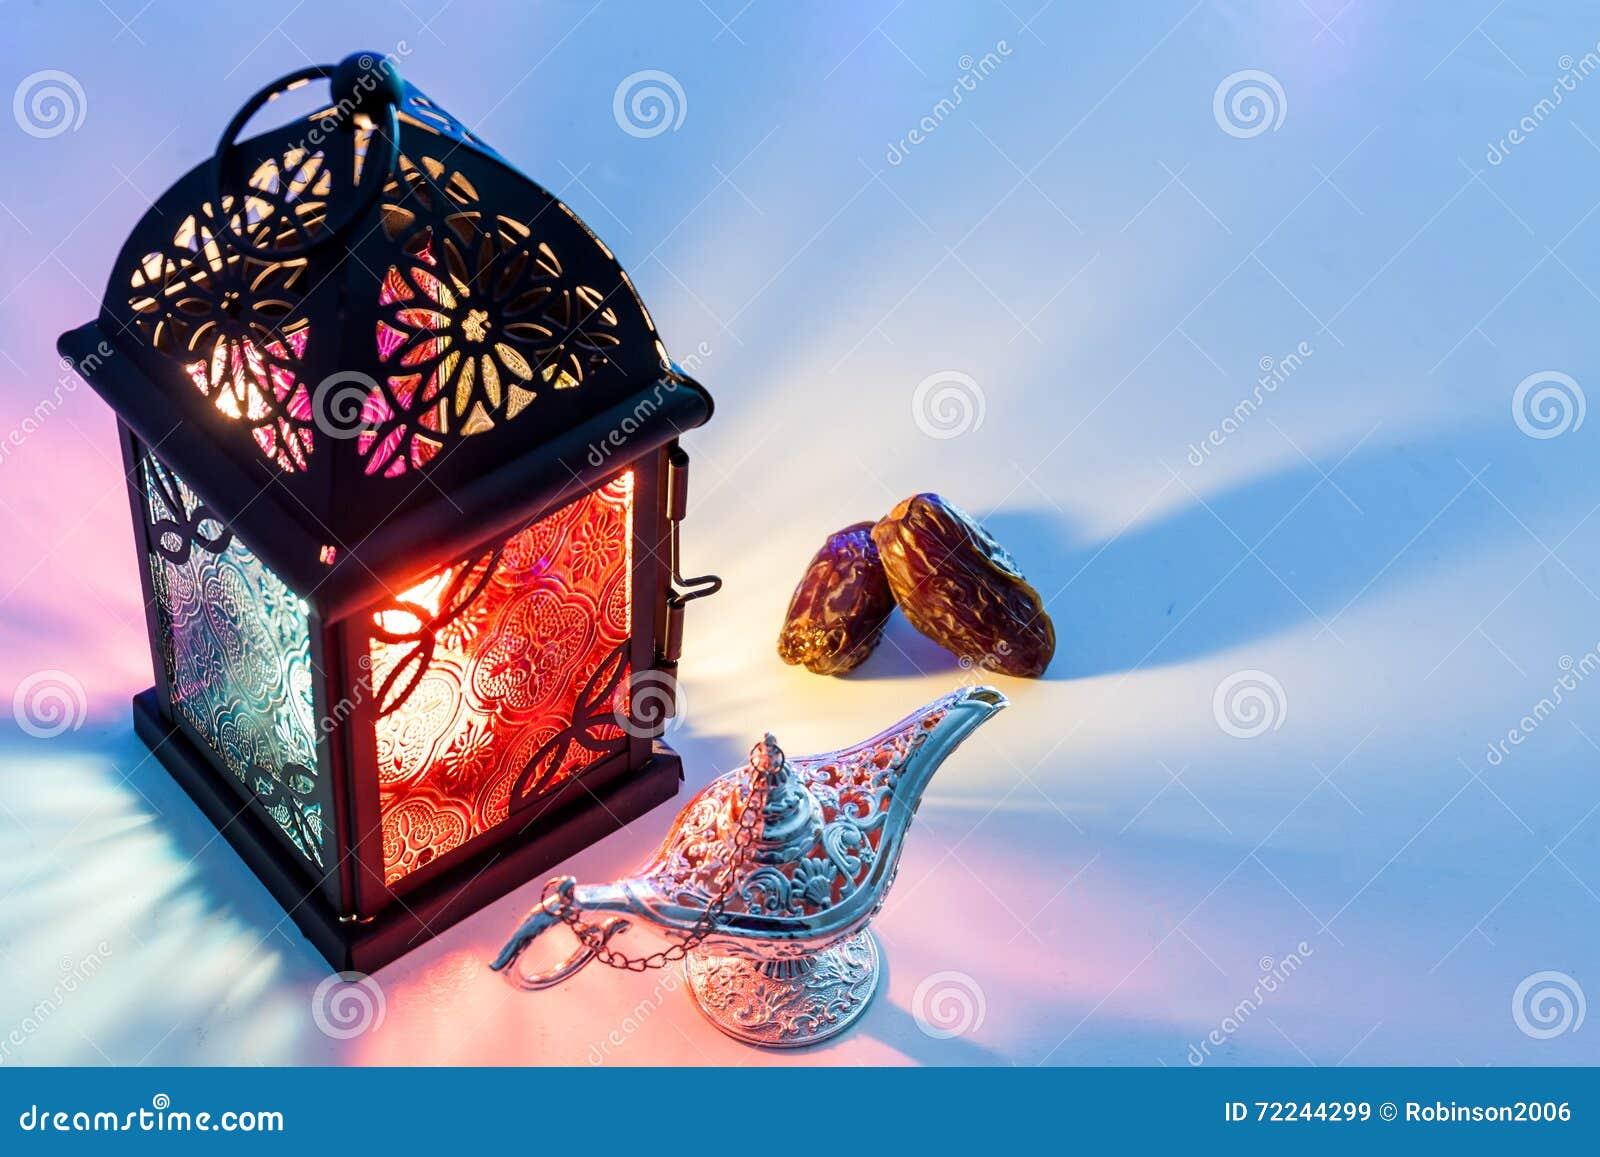 Aladdin lamp dating